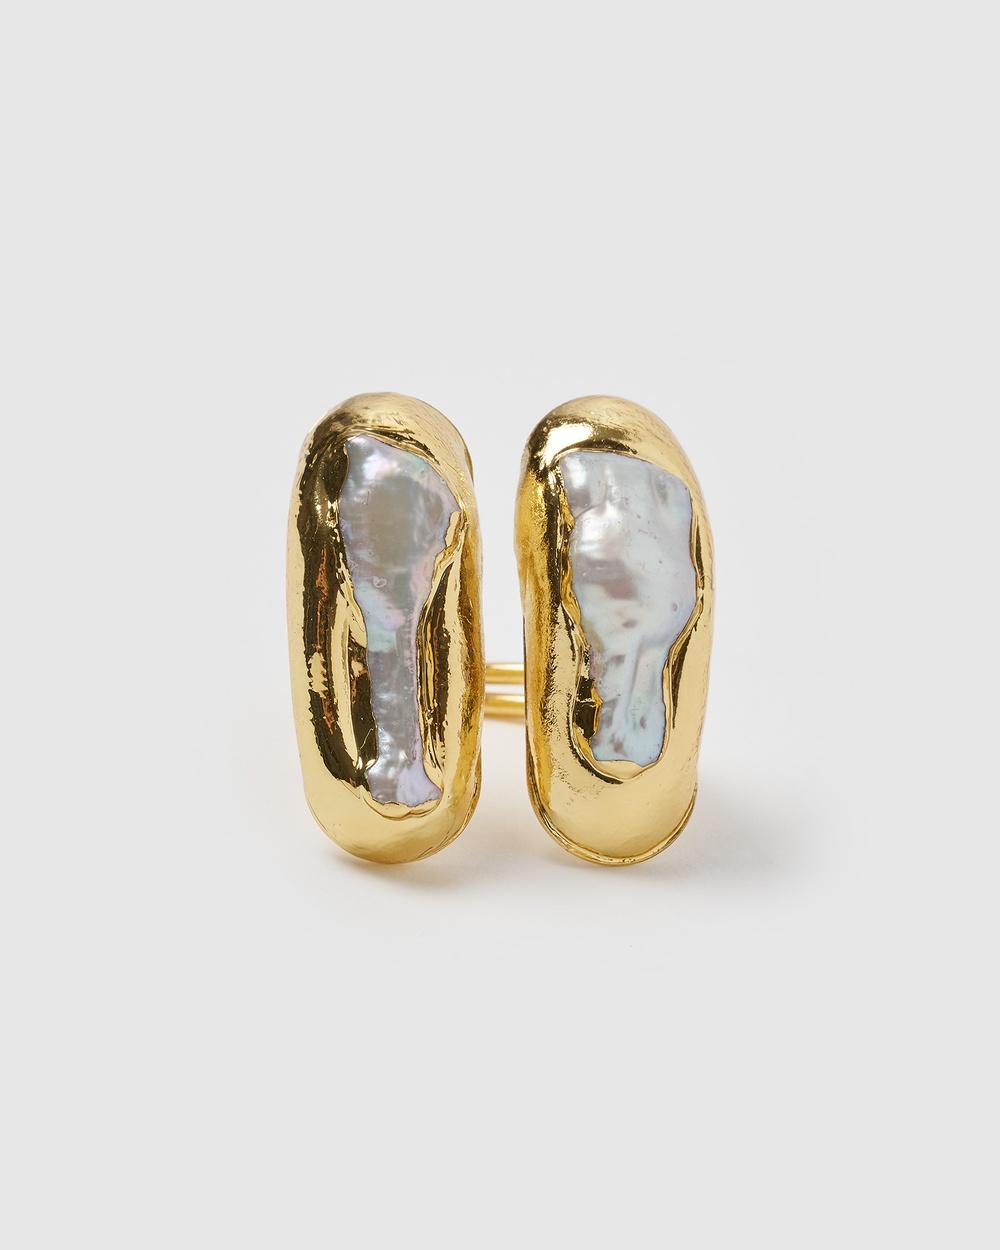 Miz Casa and Co Mara Ring Jewellery Gold Freshwater Pearl